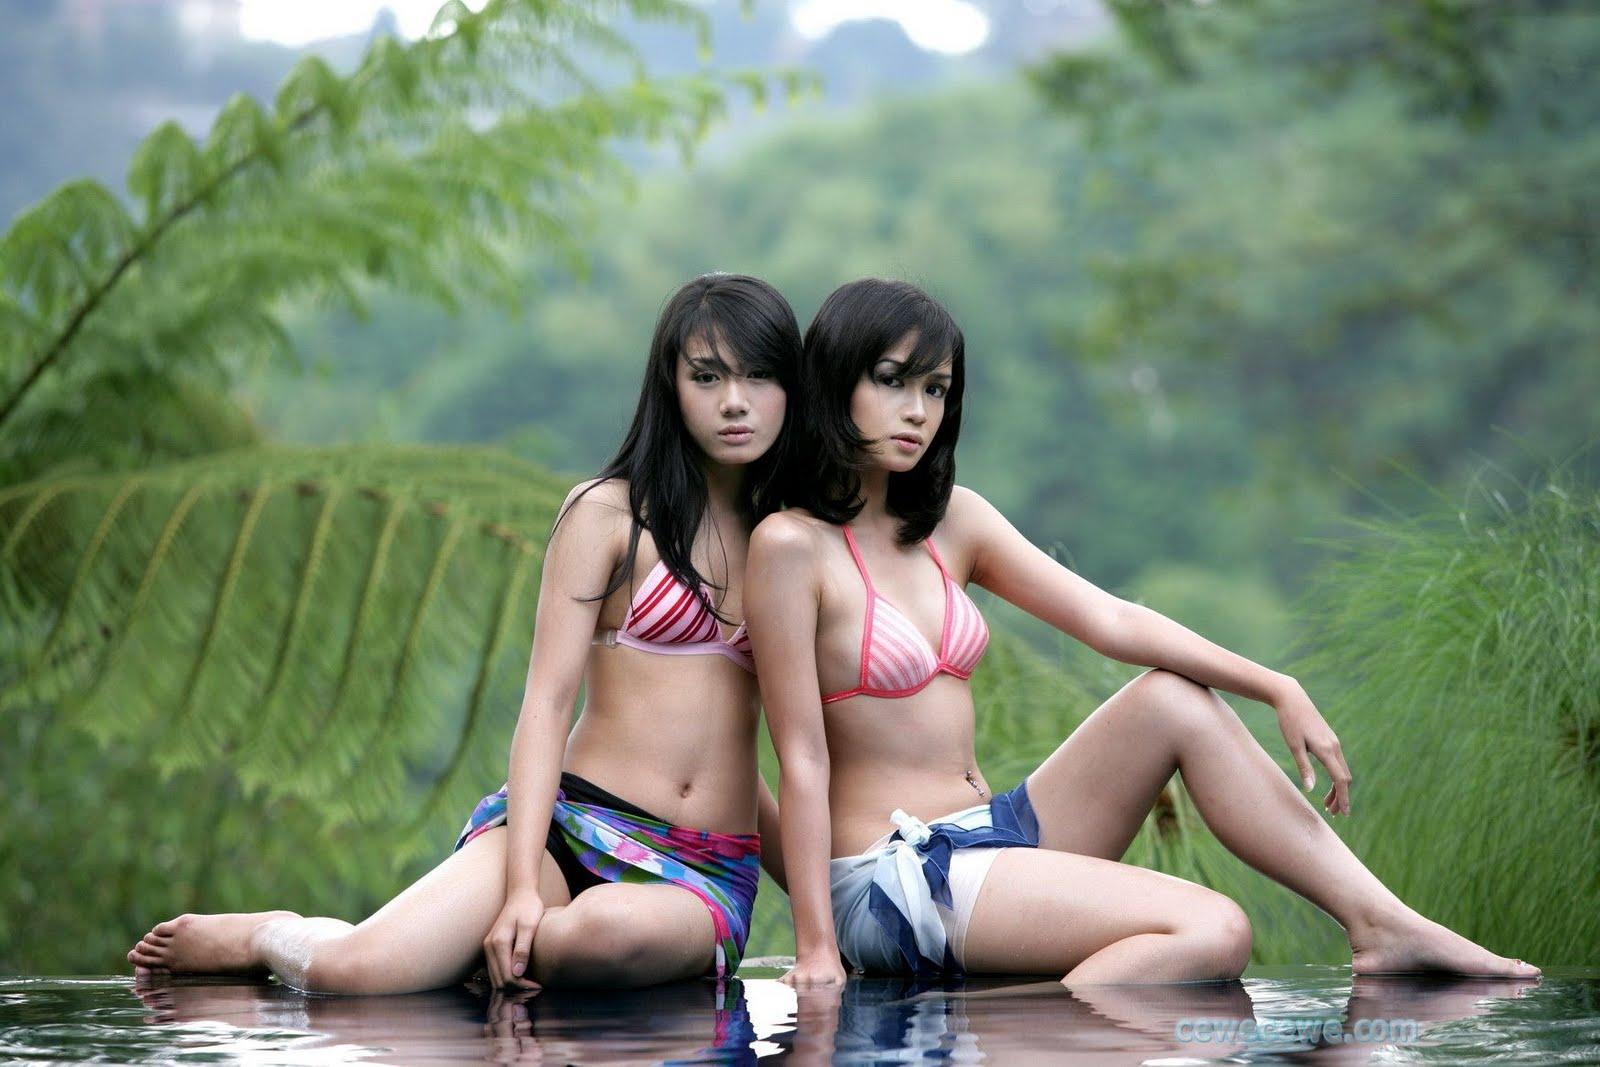 hotupdates33 topless bikini girls hd photo tour hotupdates33